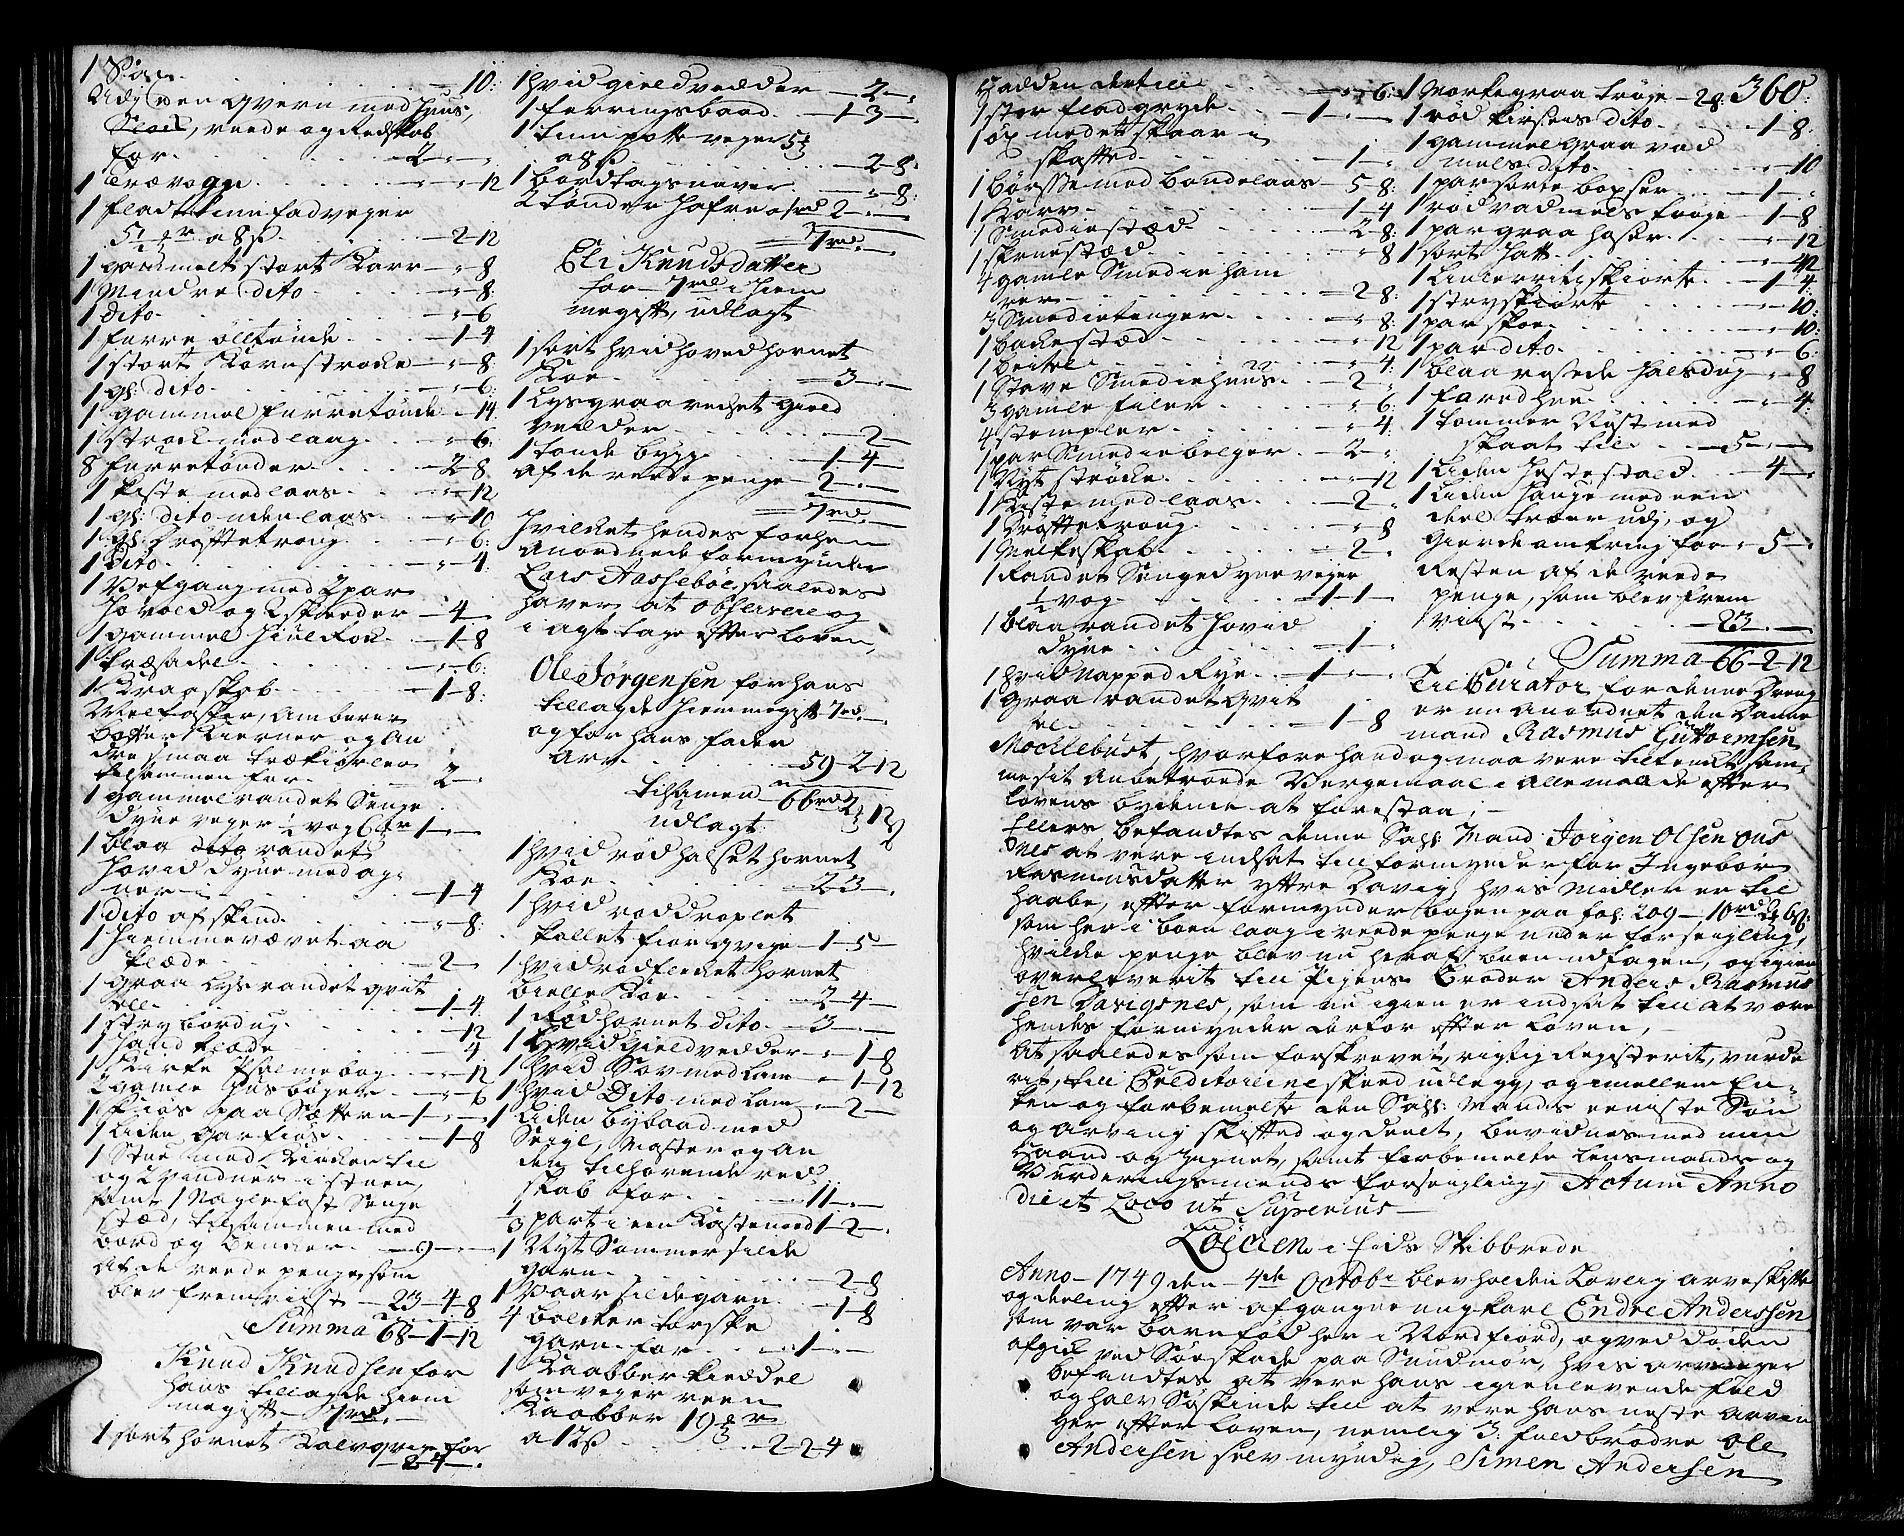 SAB, Nordfjord Sorenskriveri, 04/04a/L0010: Skifteprotokollar, 1747-1750, s. 359b-360a